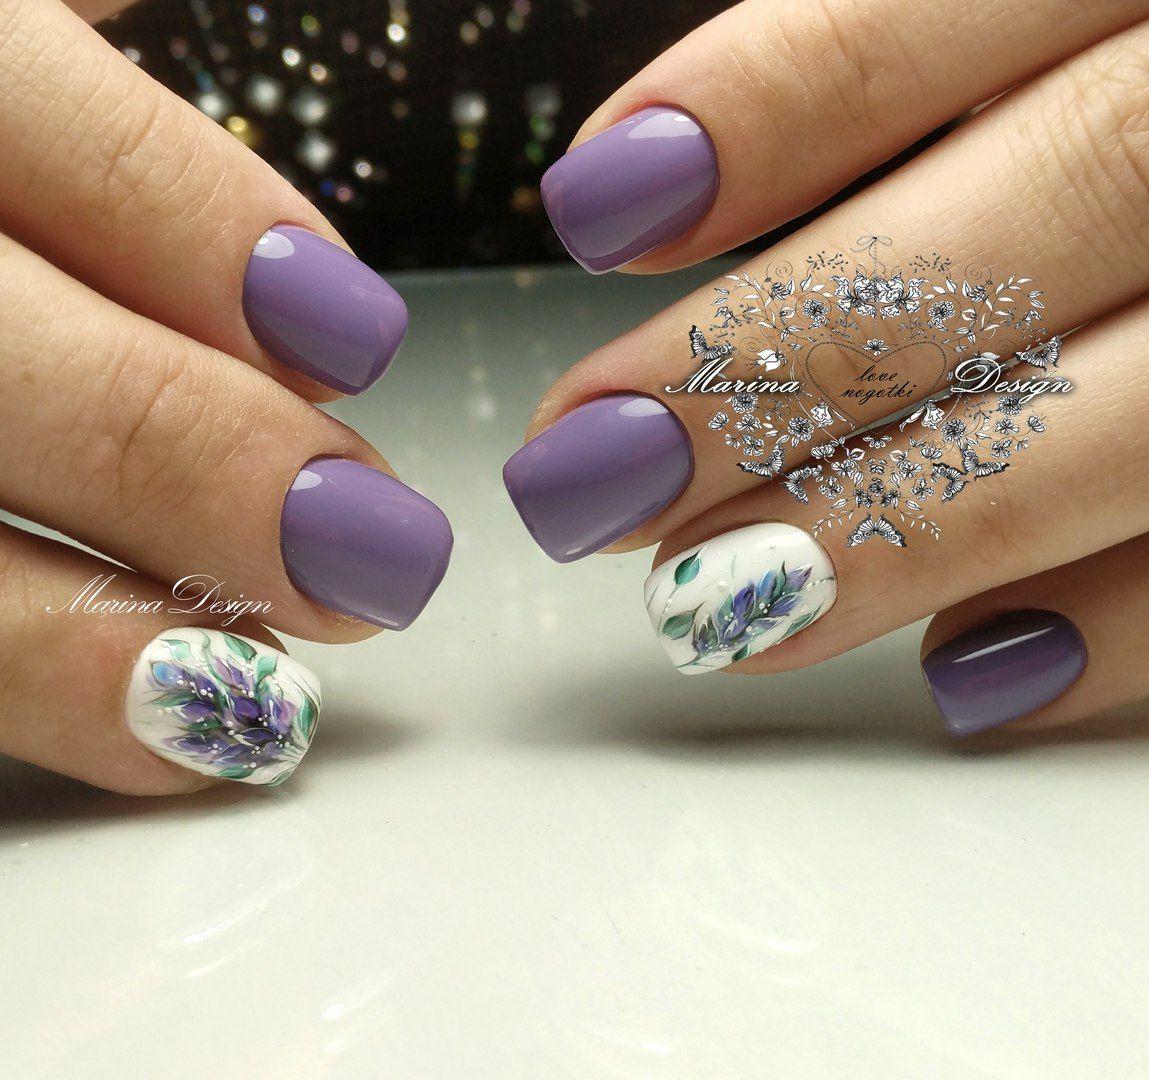 Nail Art #4023 - Best Nail Art Designs Gallery | Nail art design ...